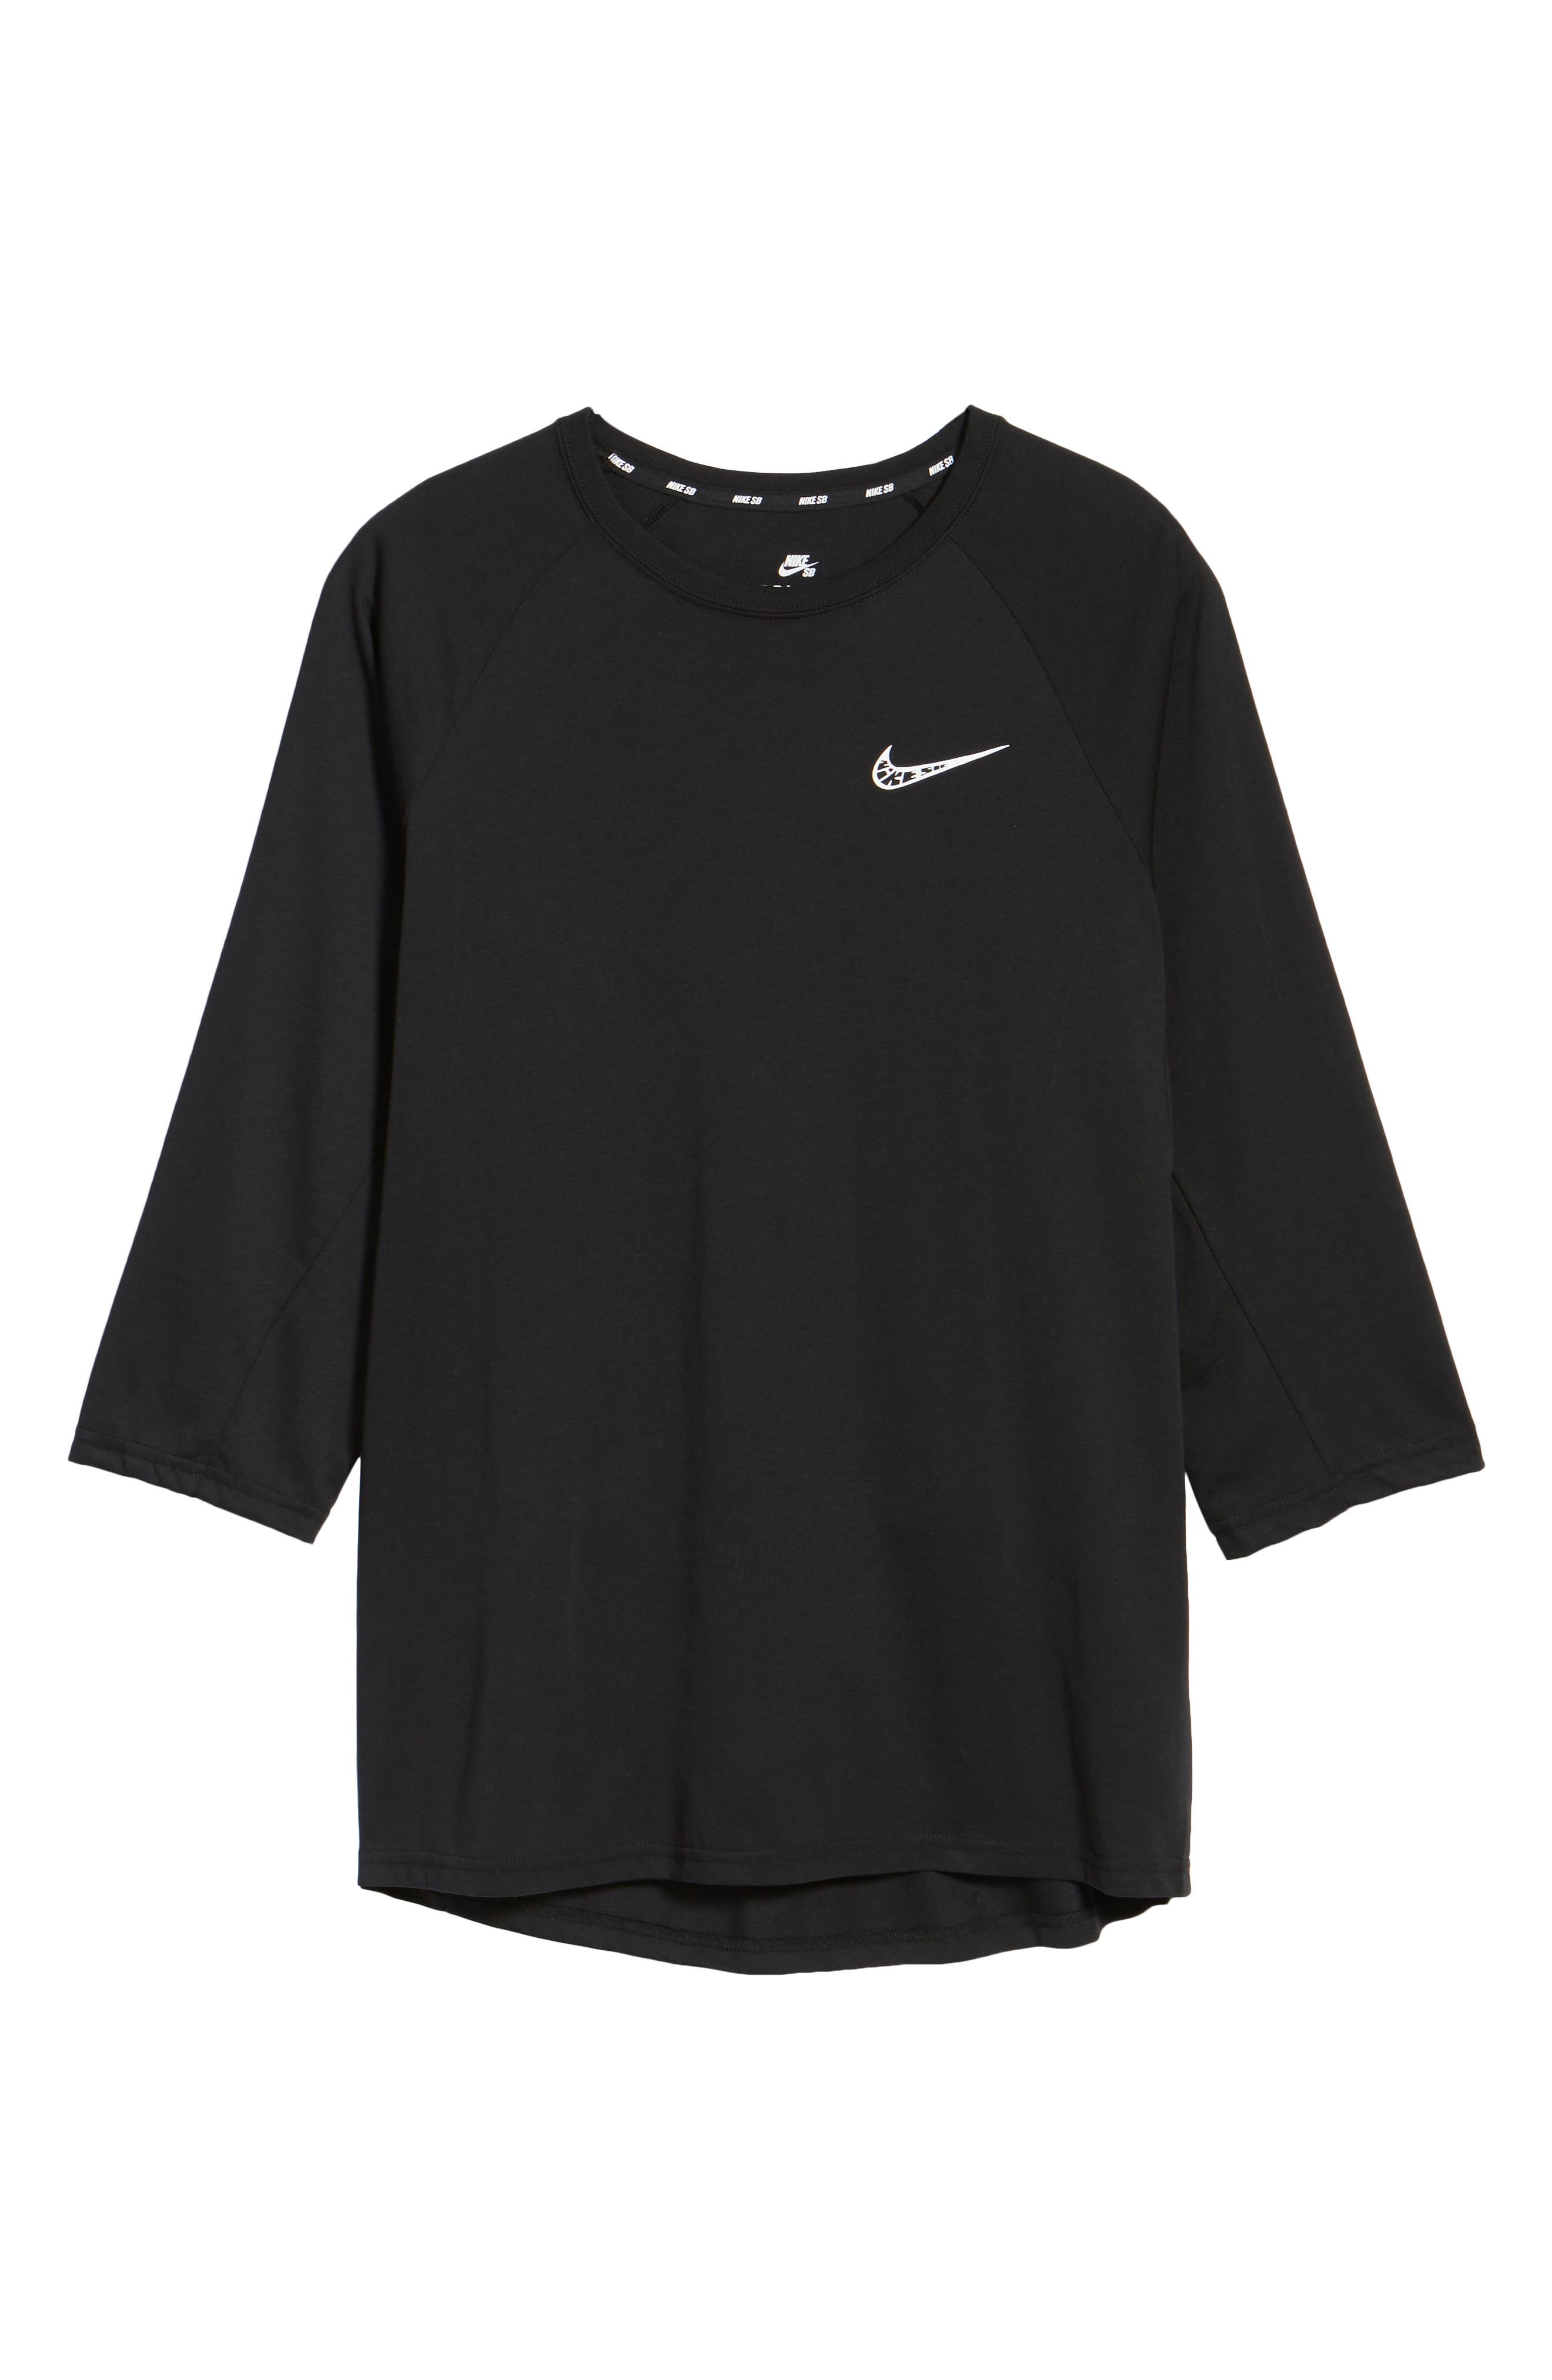 Dry Baseball T-Shirt,                             Alternate thumbnail 6, color,                             BLACK/ BLACK/ WHITE